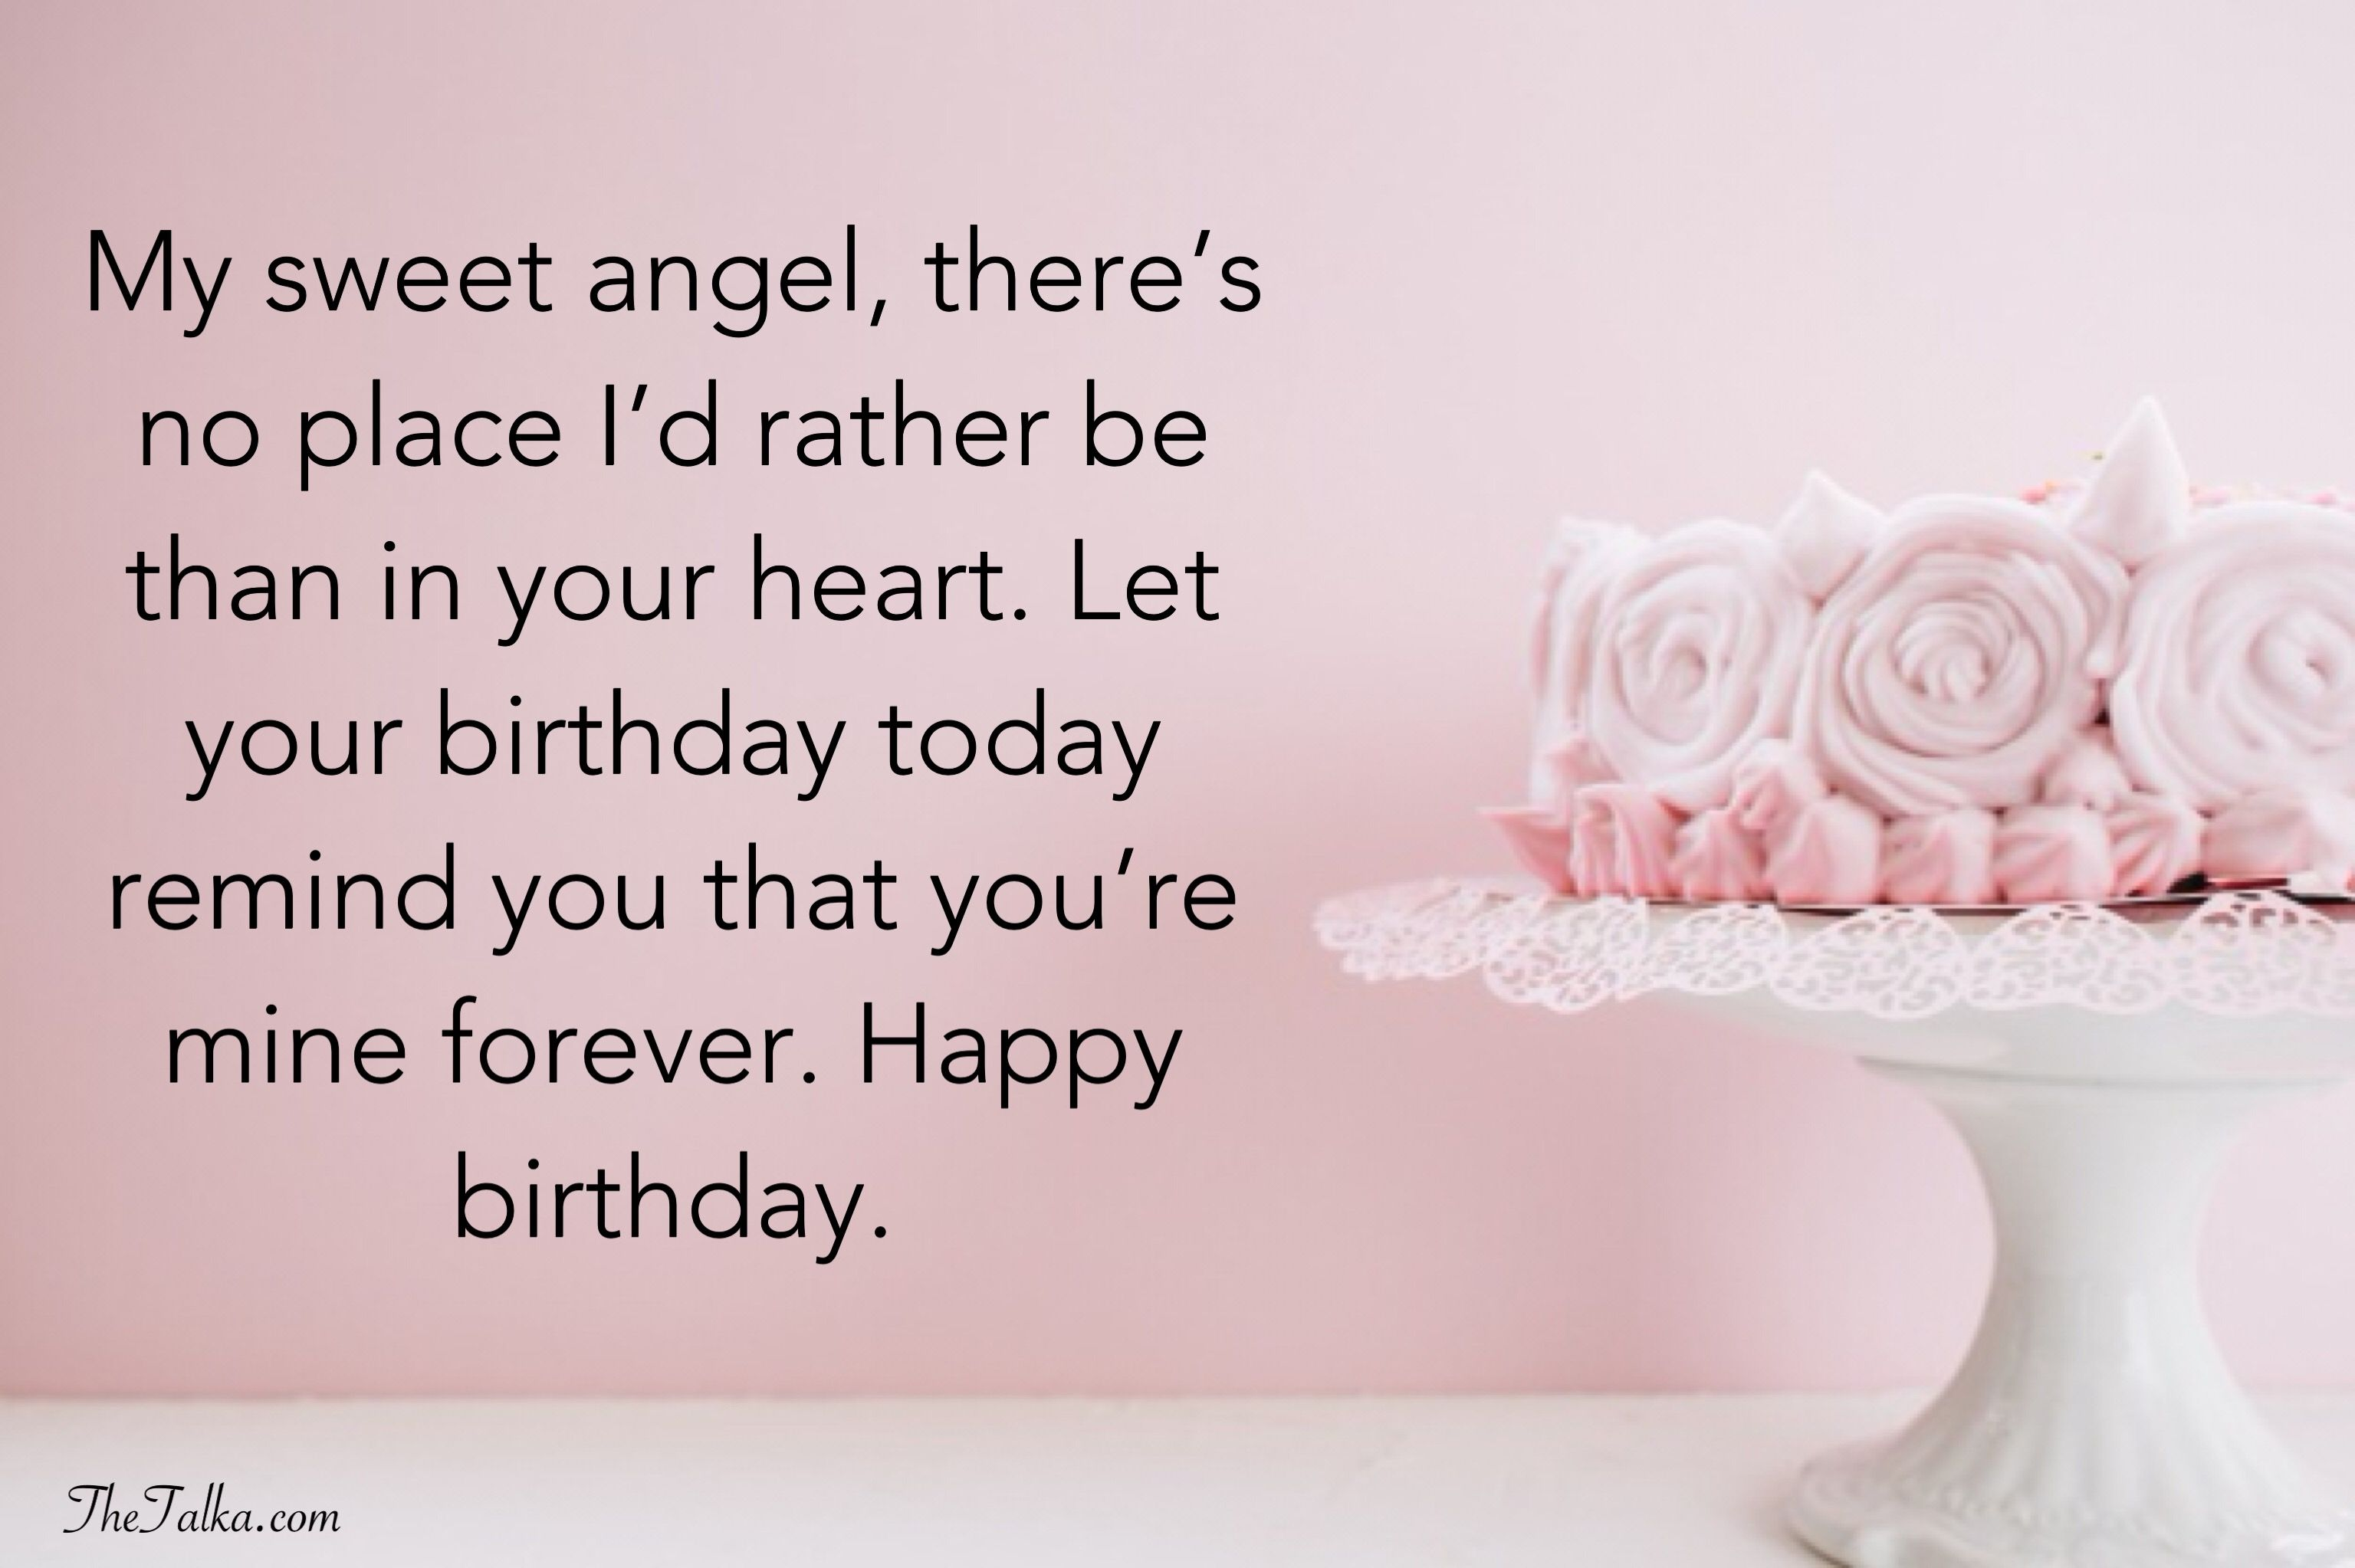 Birthday Wishes For Girlfriend Heartwarming, Impressive